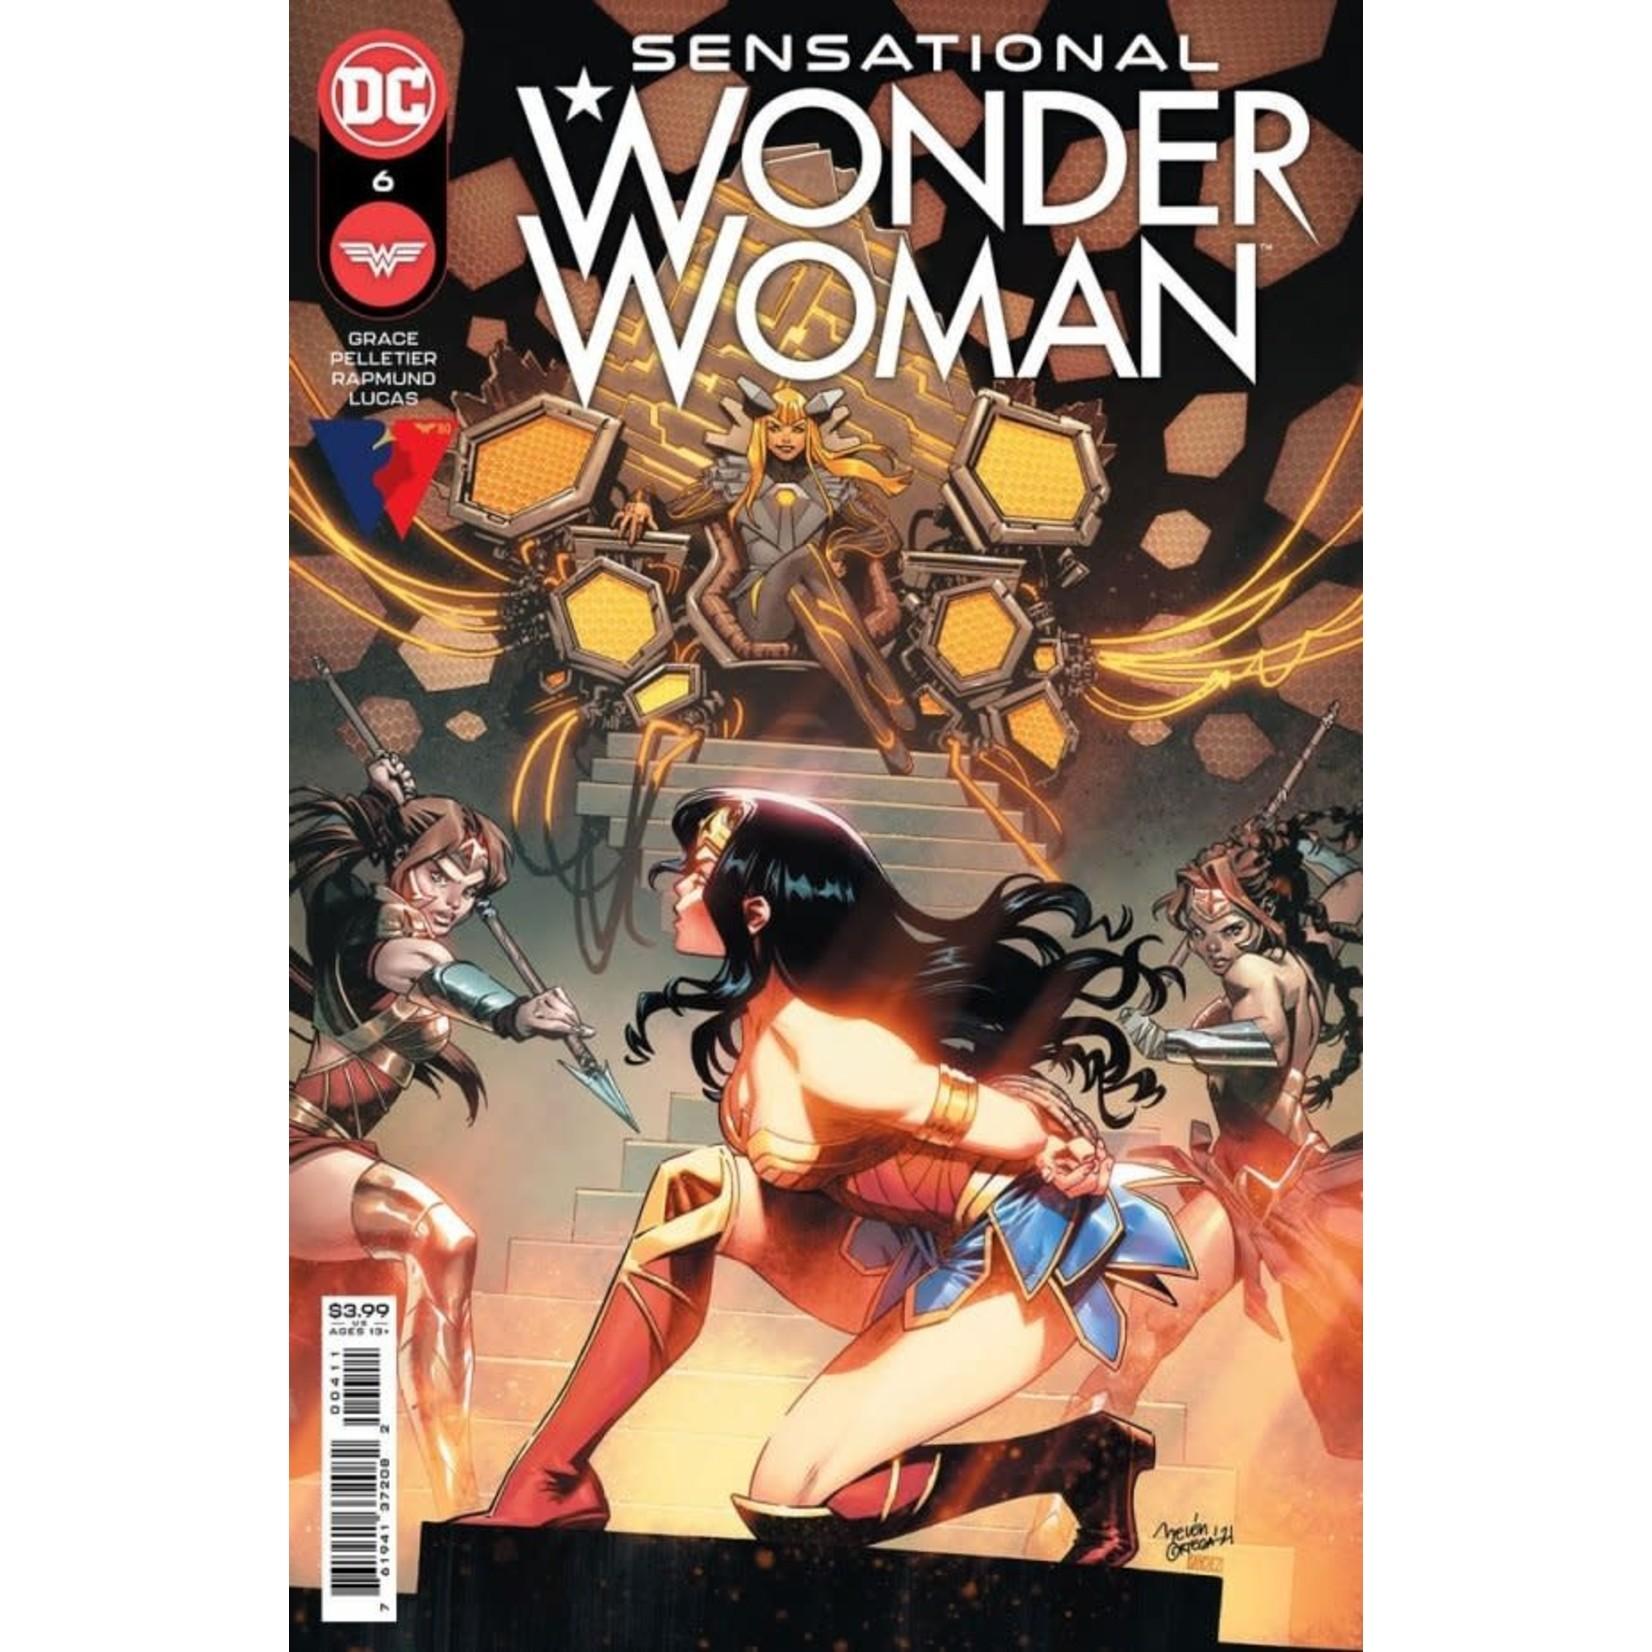 DC Comics Sensational Wonder Woman #6